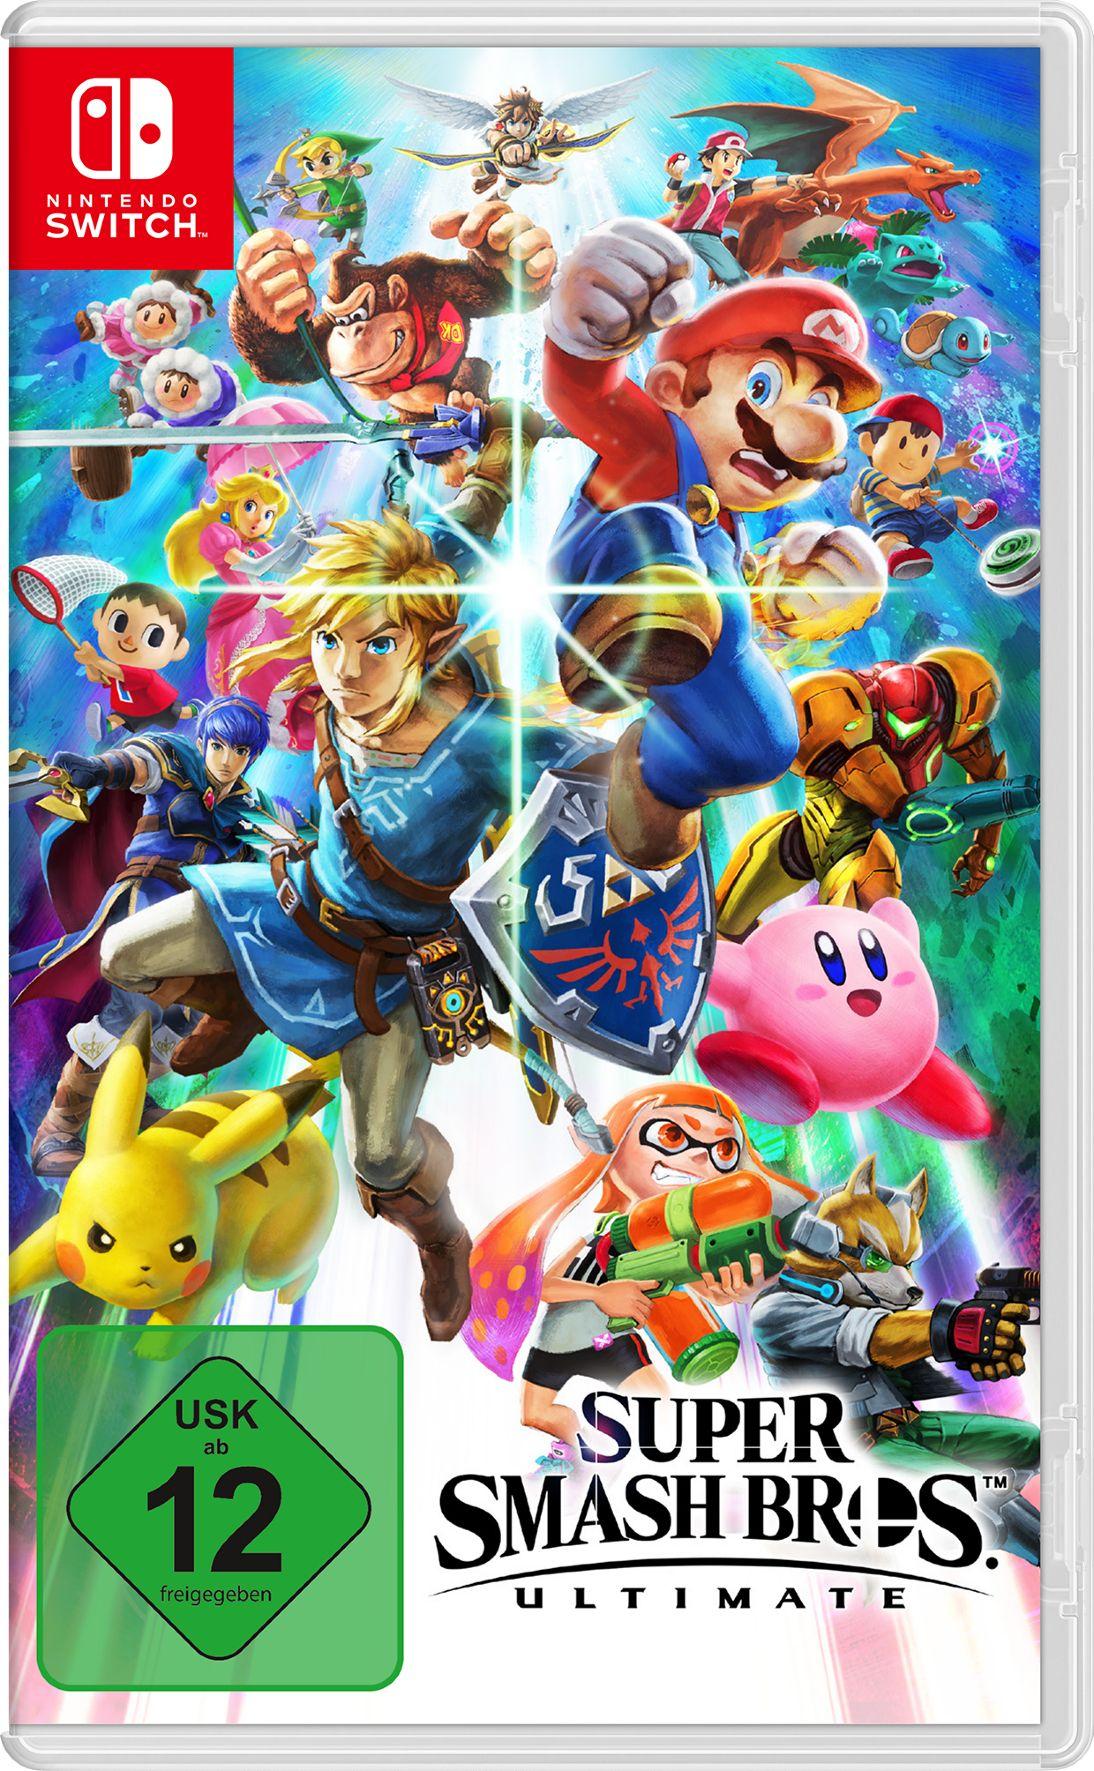 [SWITCH] Super Smash Bros. Ultimate